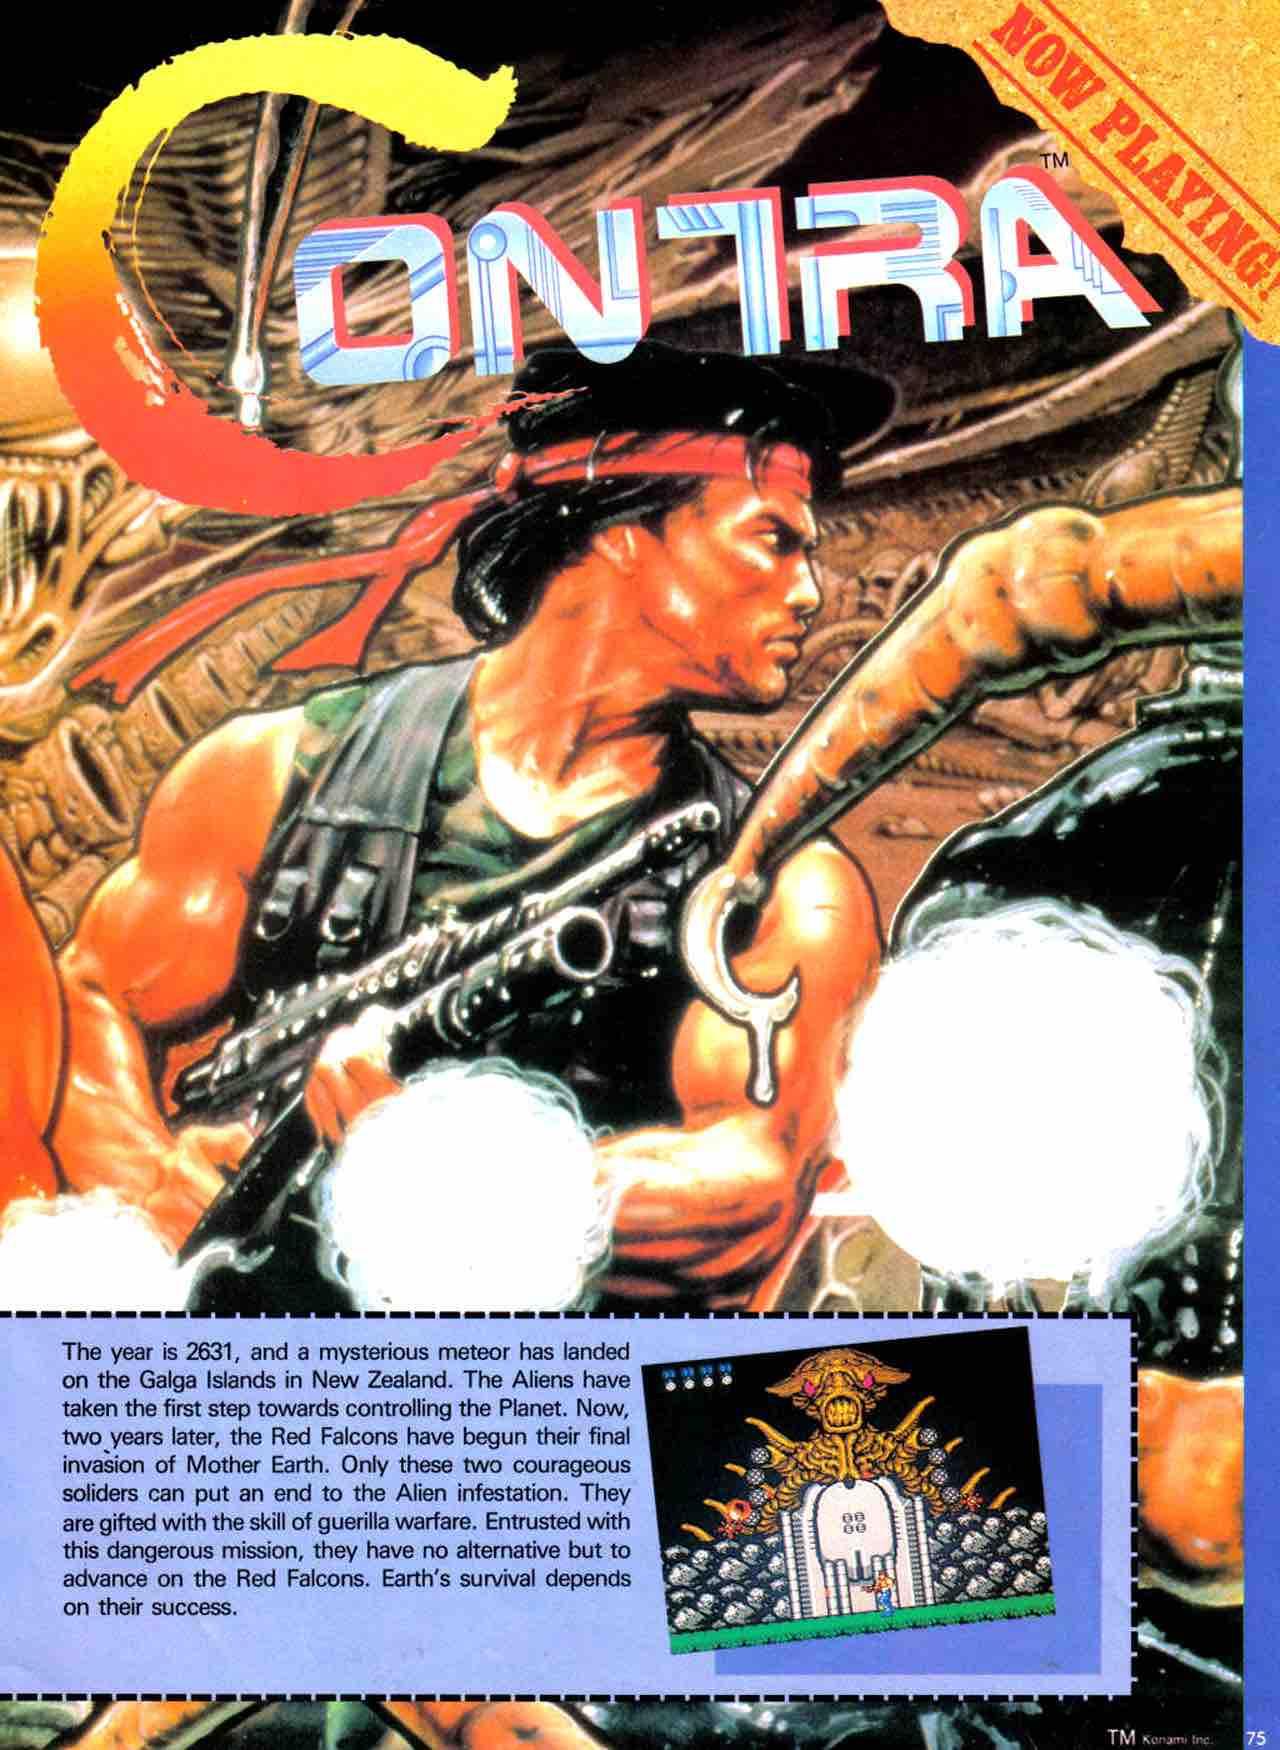 Nintendo Power | July August 1988 - pg 75